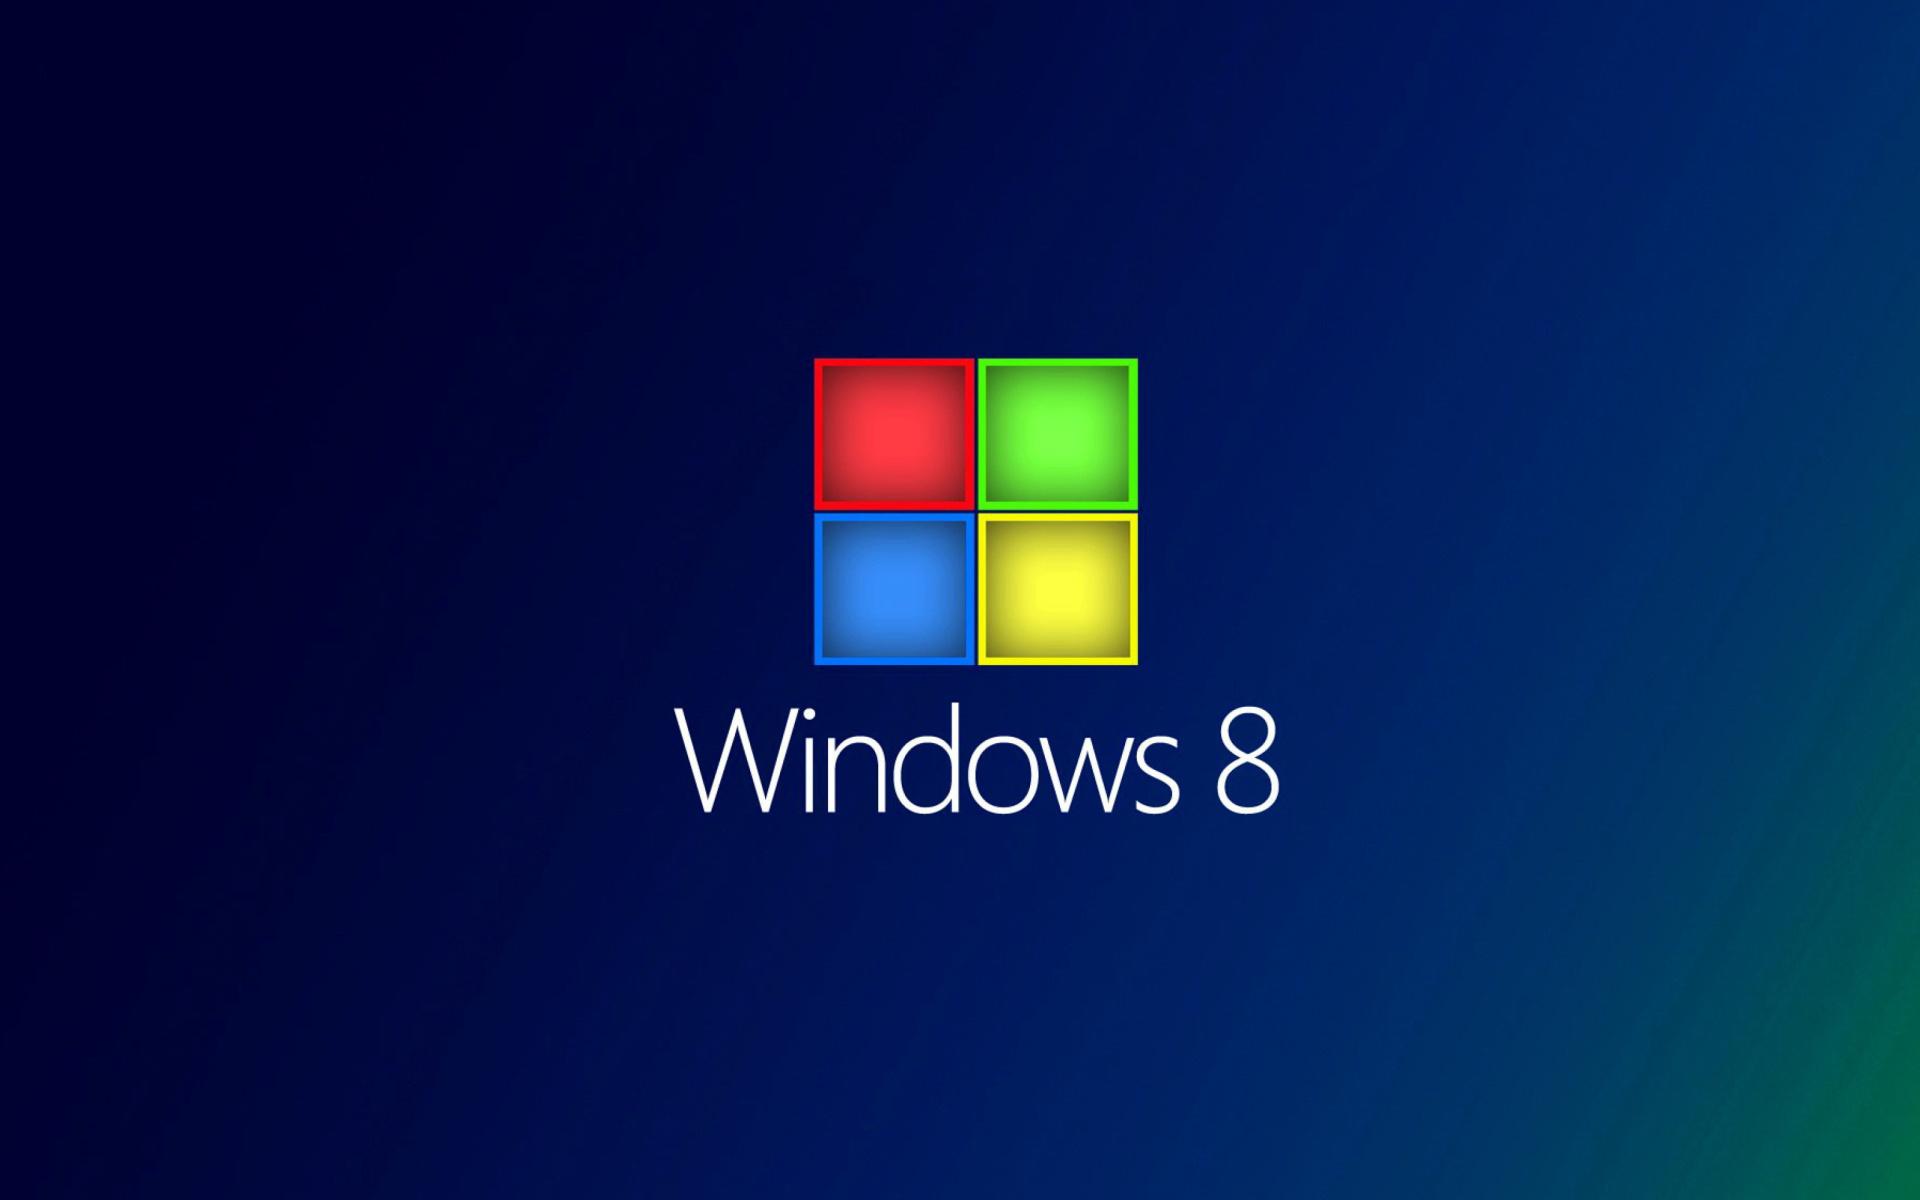 microsoft windows 8 wallpaper for widescreen desktop pc